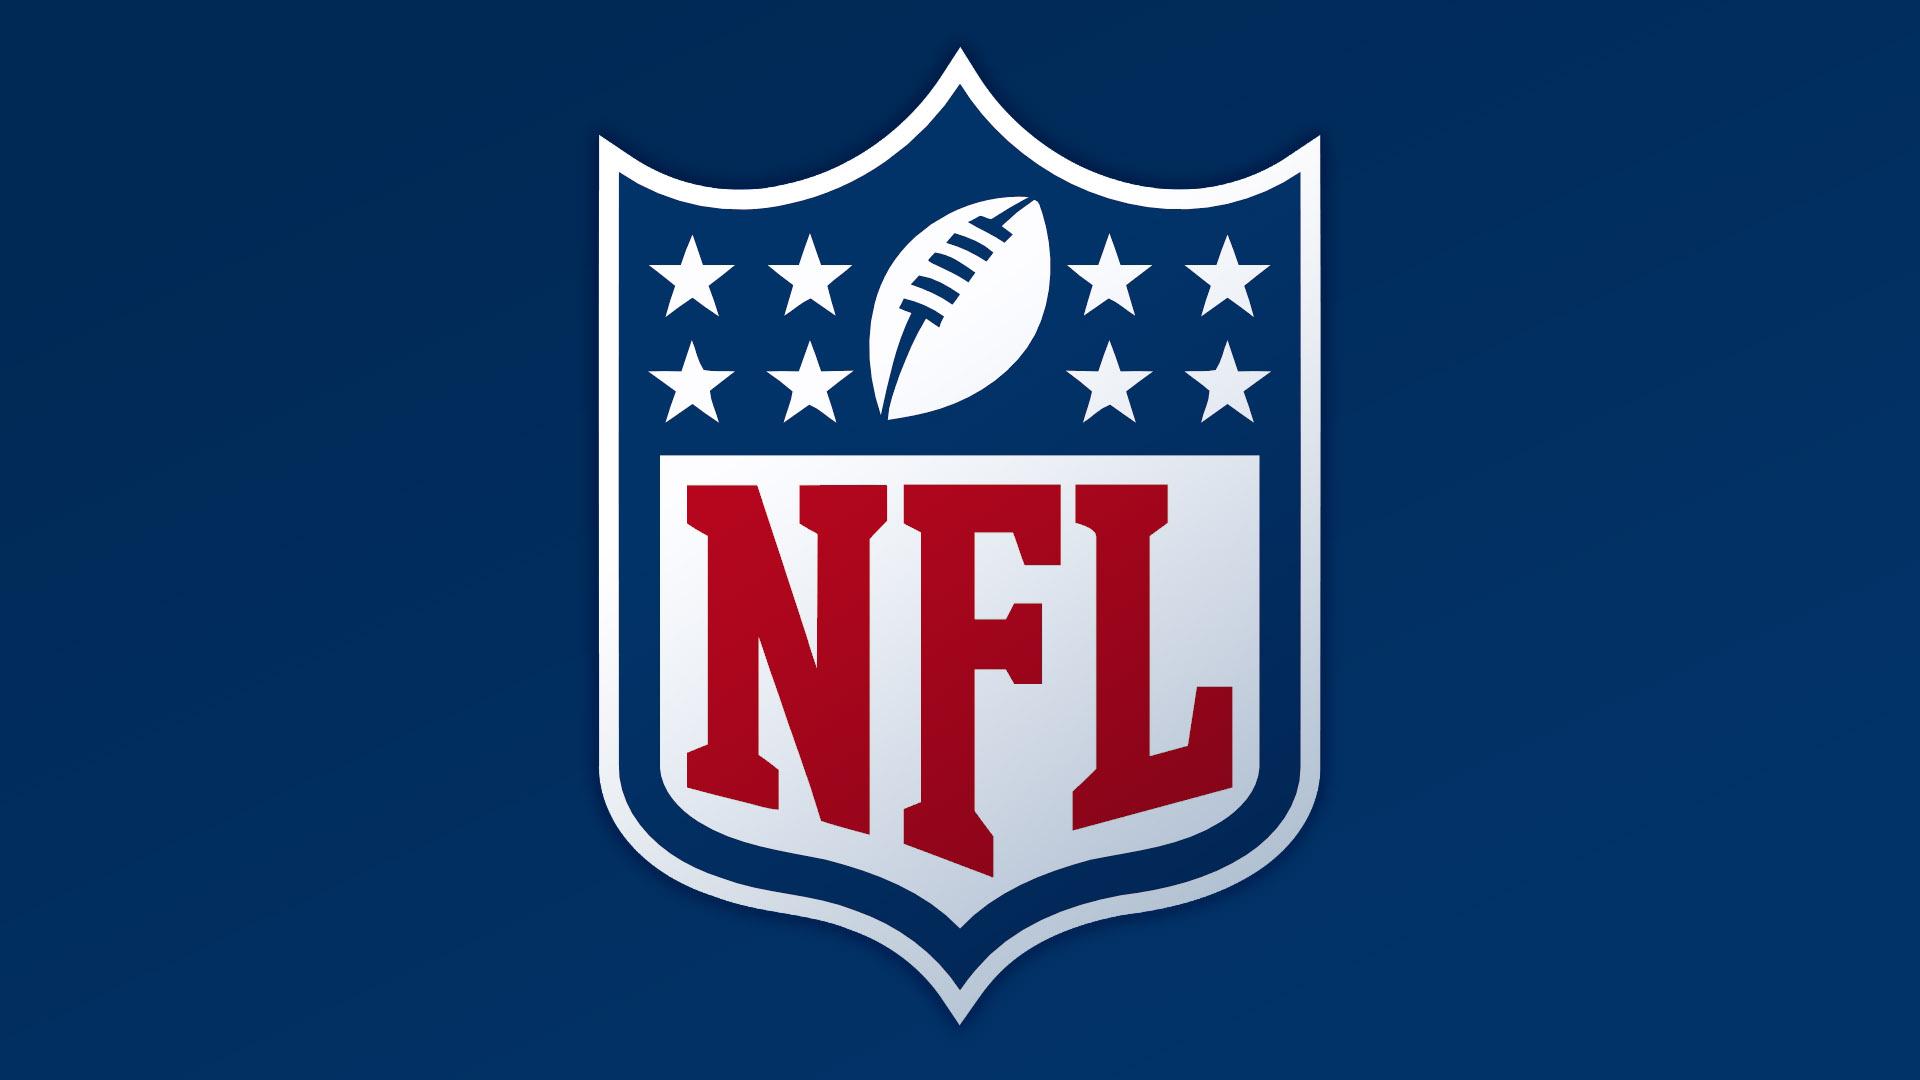 Covid-19, NFL maçlarının başlamasına engel olabilir mi?